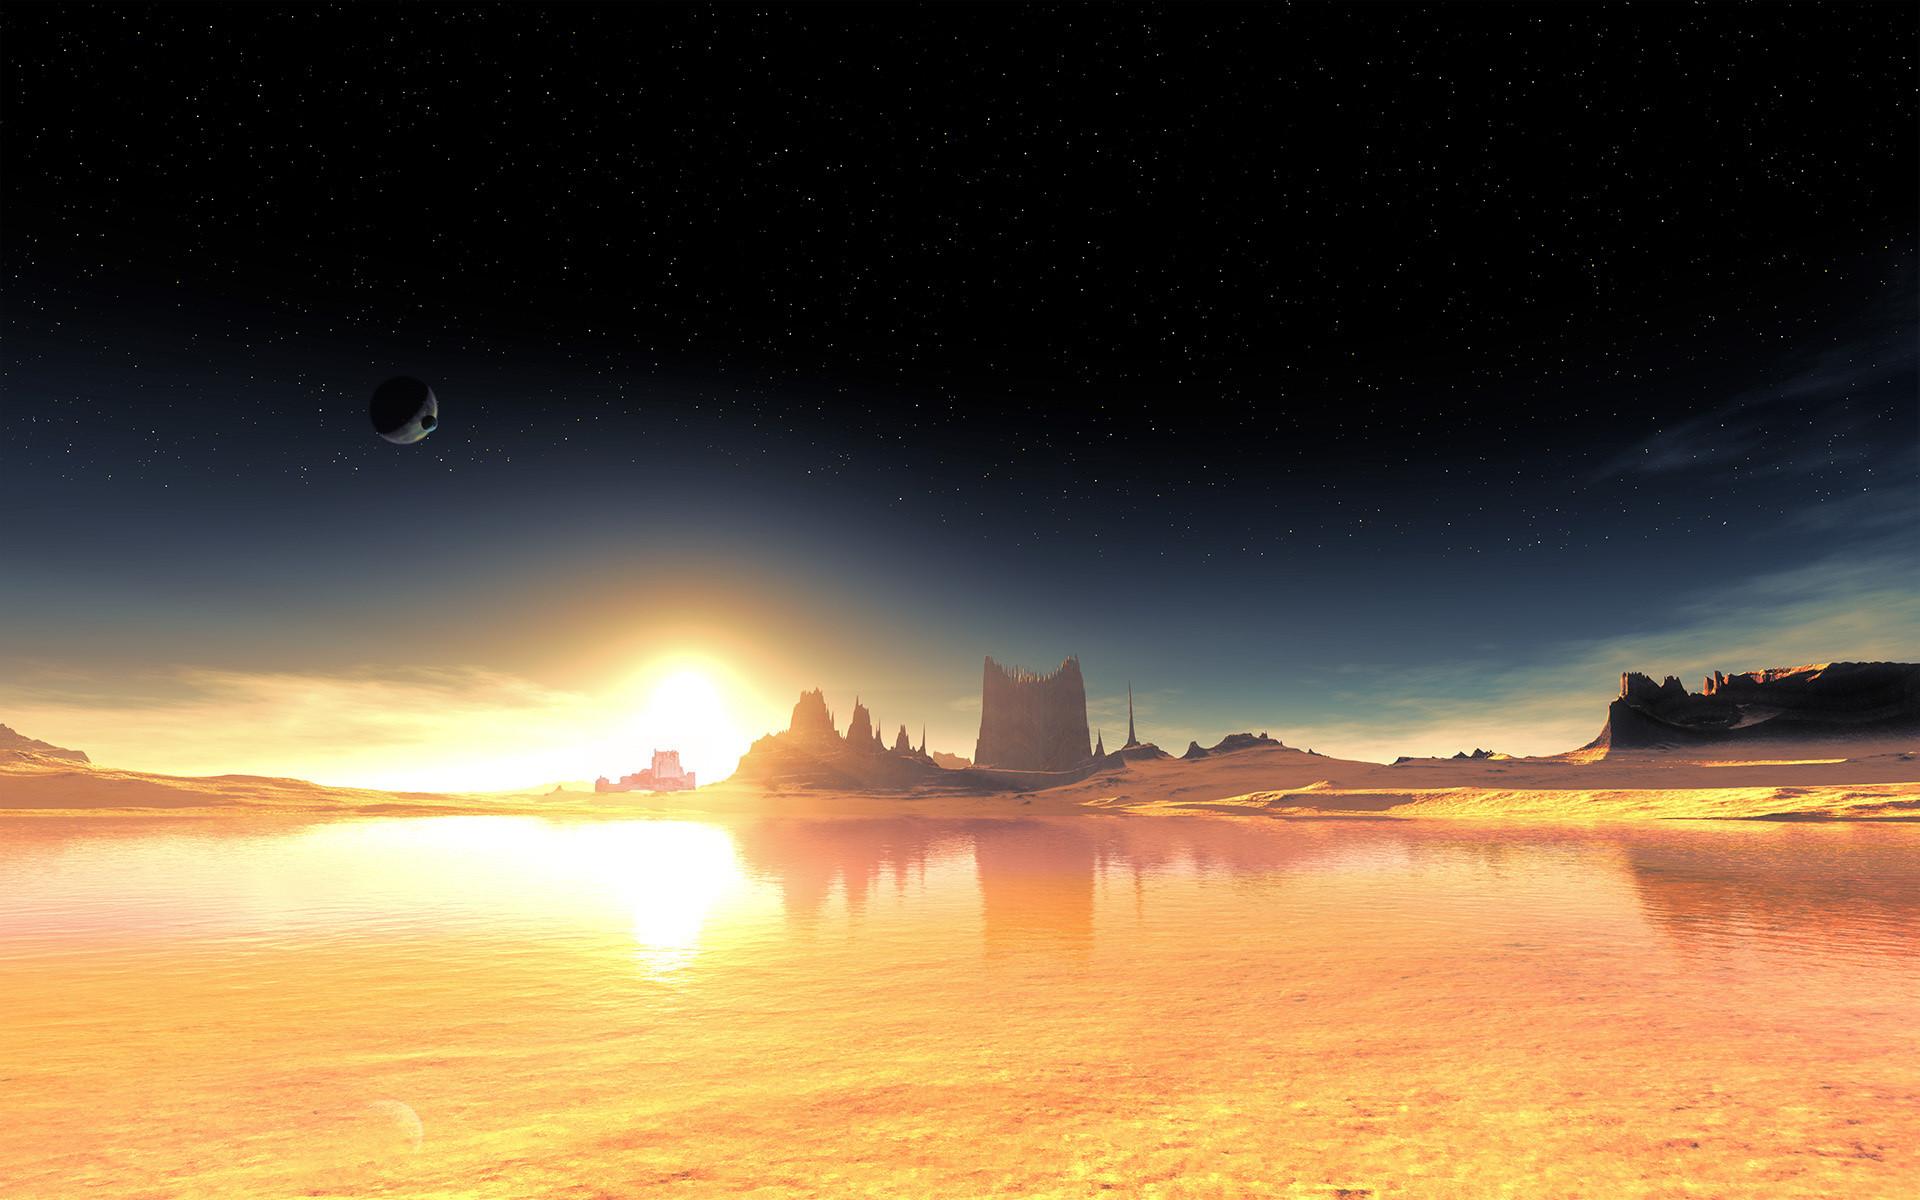 PreviousNext. Previous Image Next Image. alien planet wallpapers …